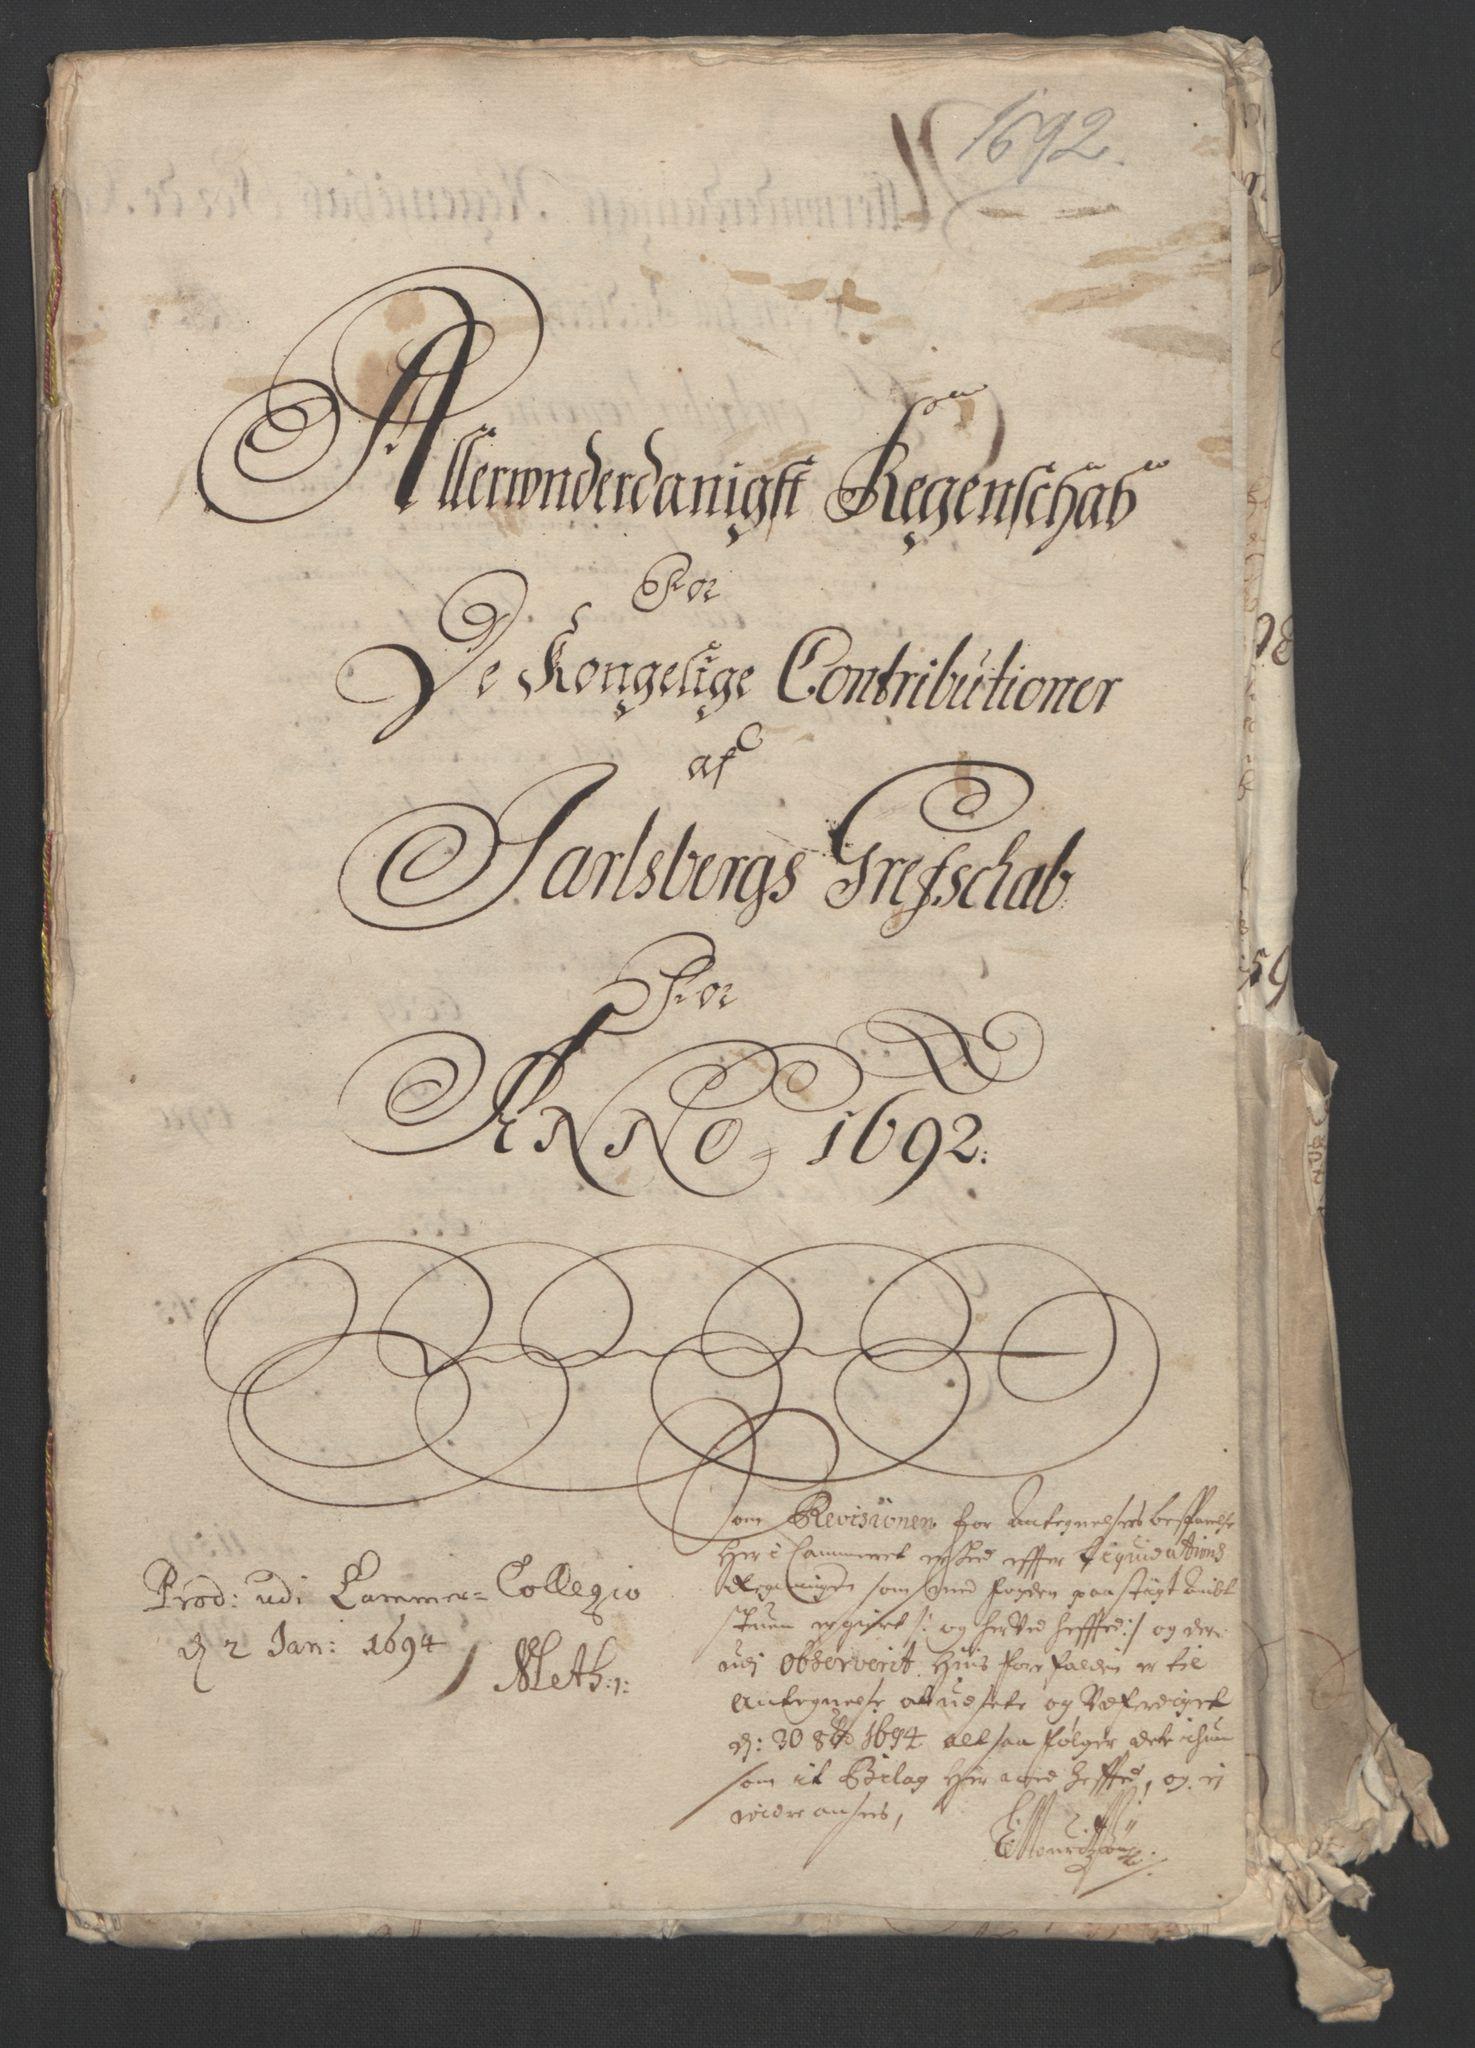 RA, Rentekammeret inntil 1814, Reviderte regnskaper, Fogderegnskap, R32/L1865: Fogderegnskap Jarlsberg grevskap, 1692, s. 3